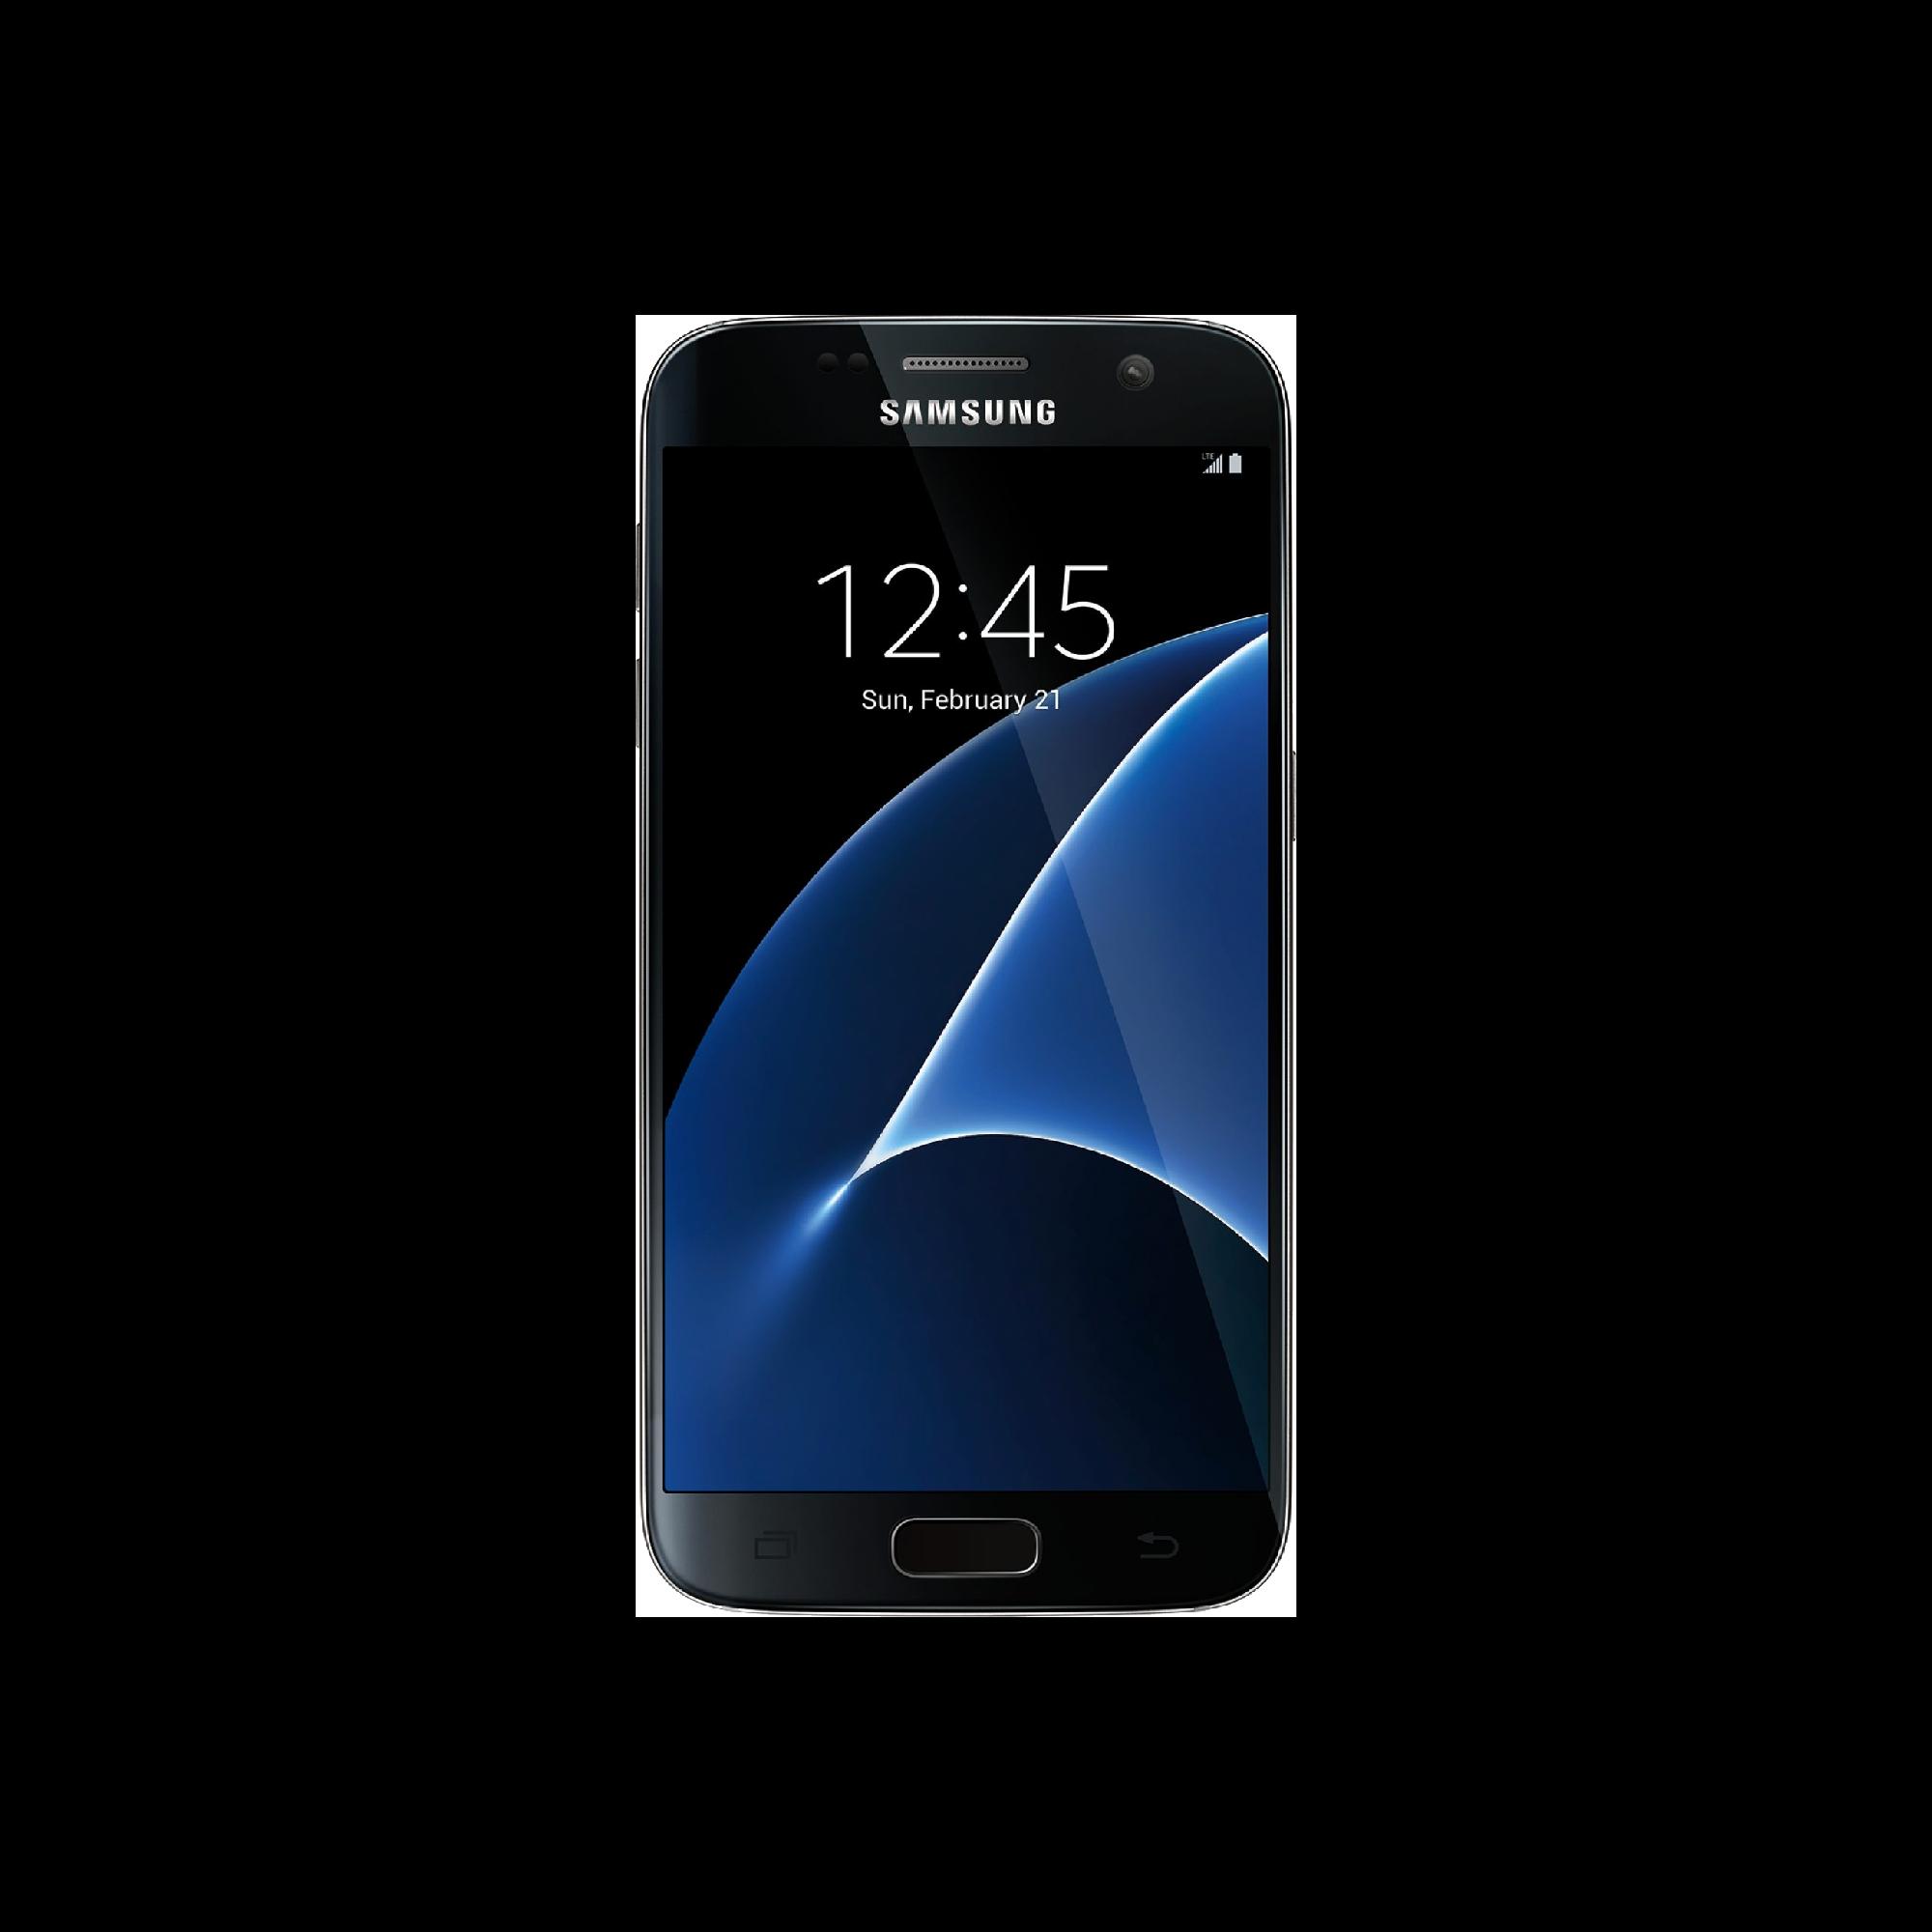 Samsung S7 | $179 + tax